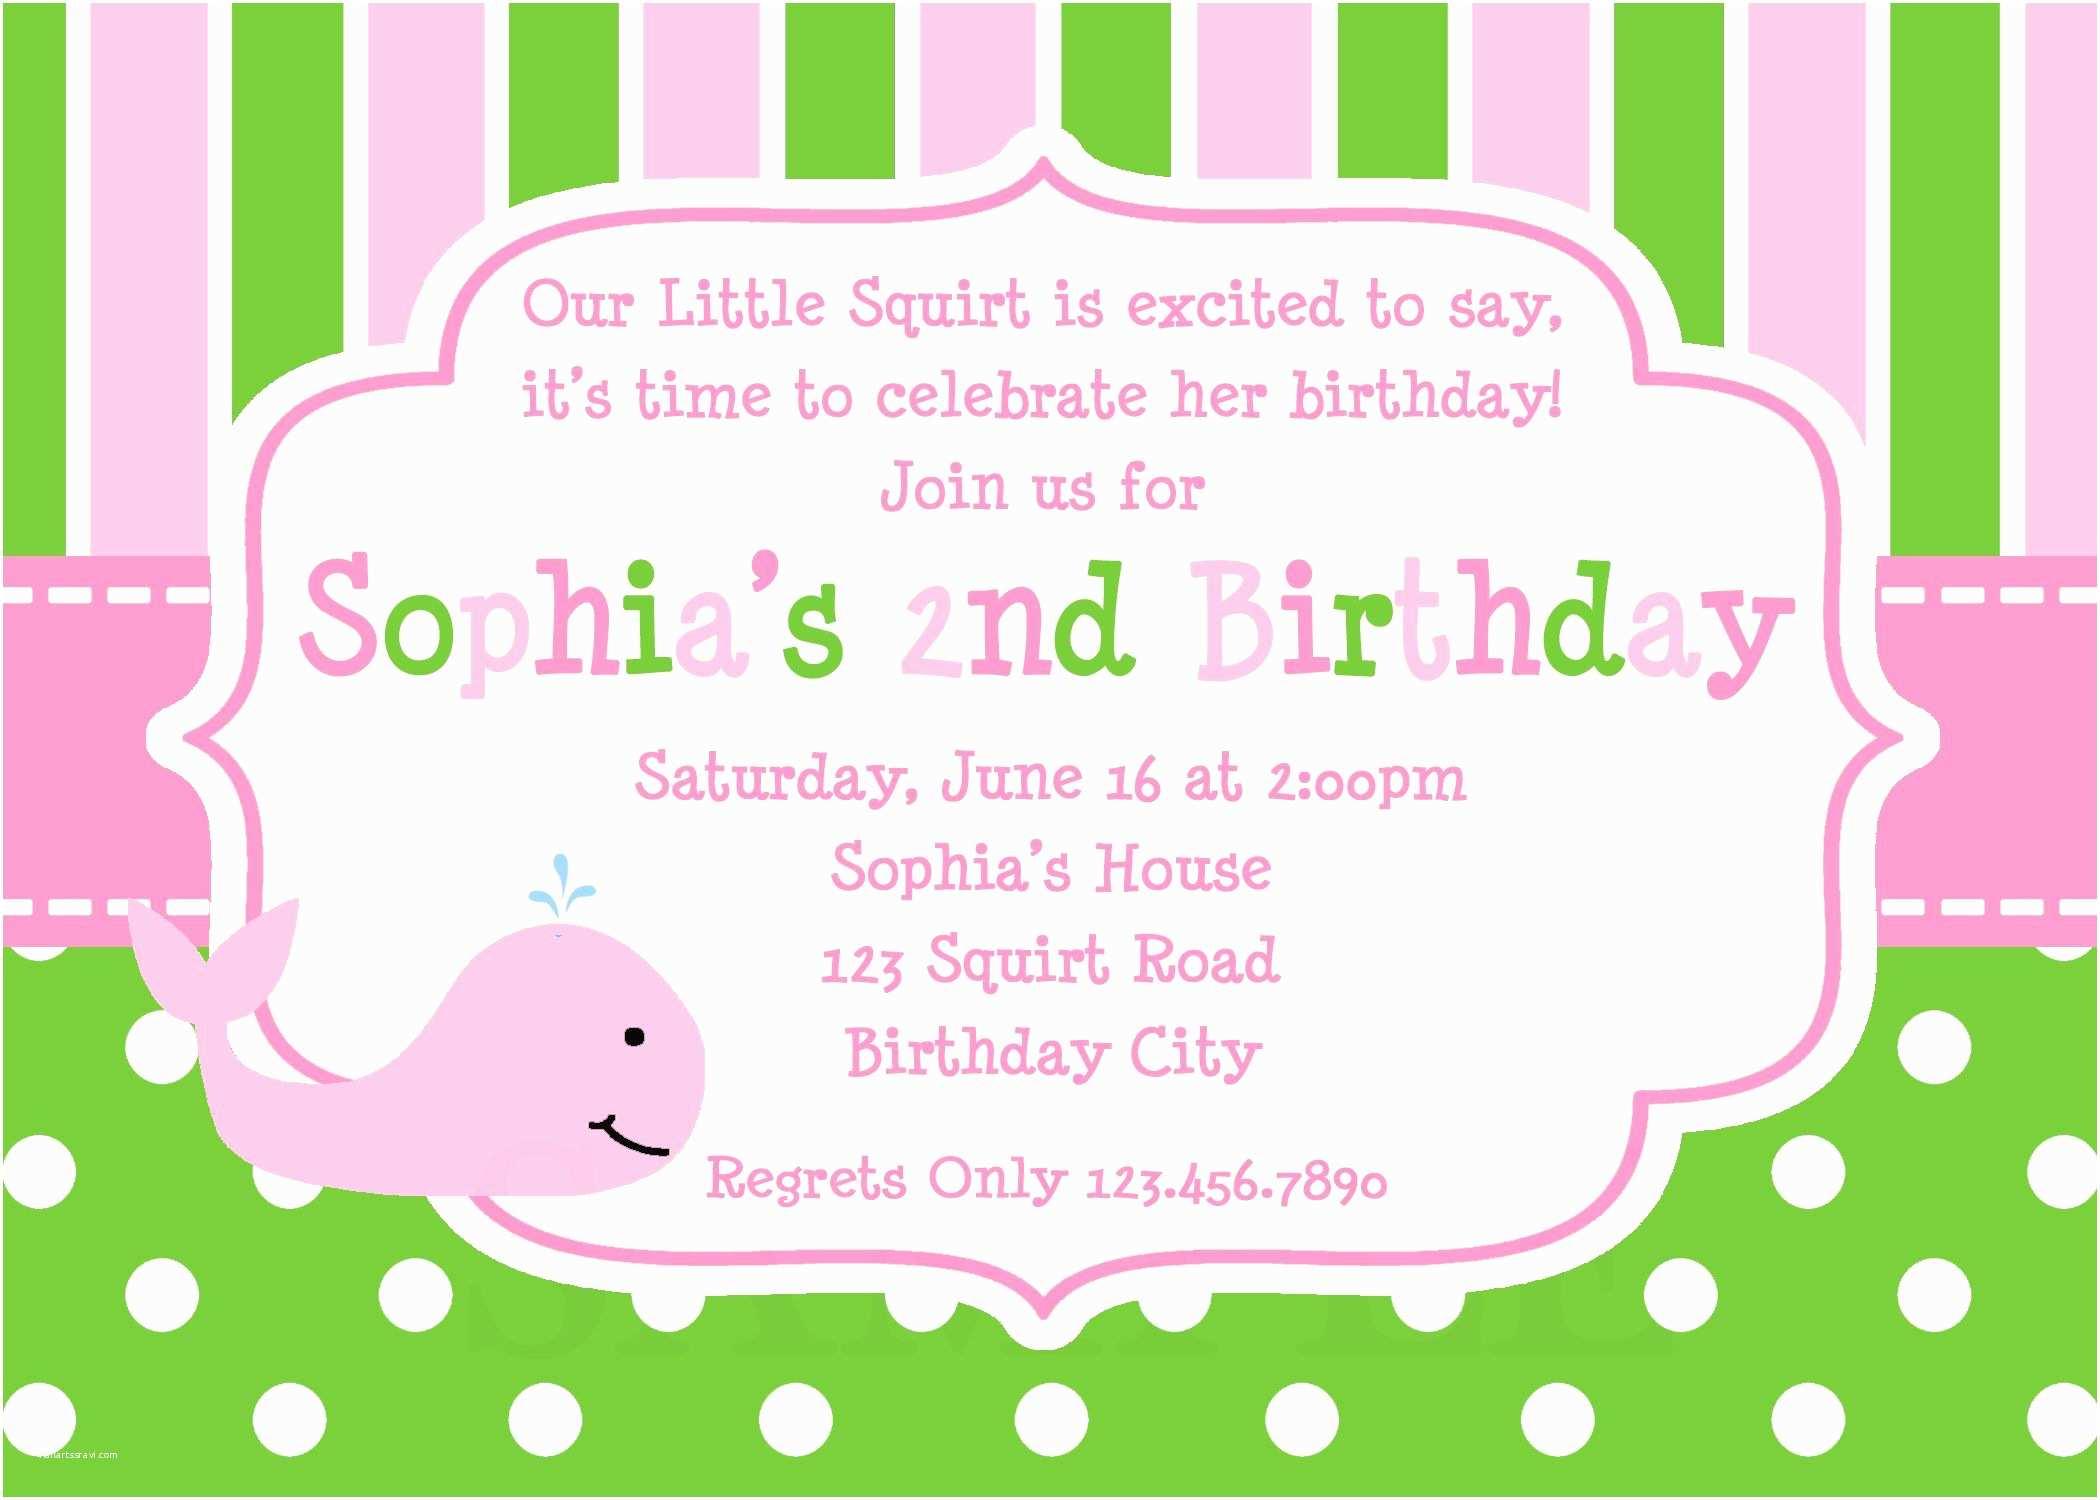 Birthday Invitation Templates 21 Kids Birthday Invitation Wording that We Can Make